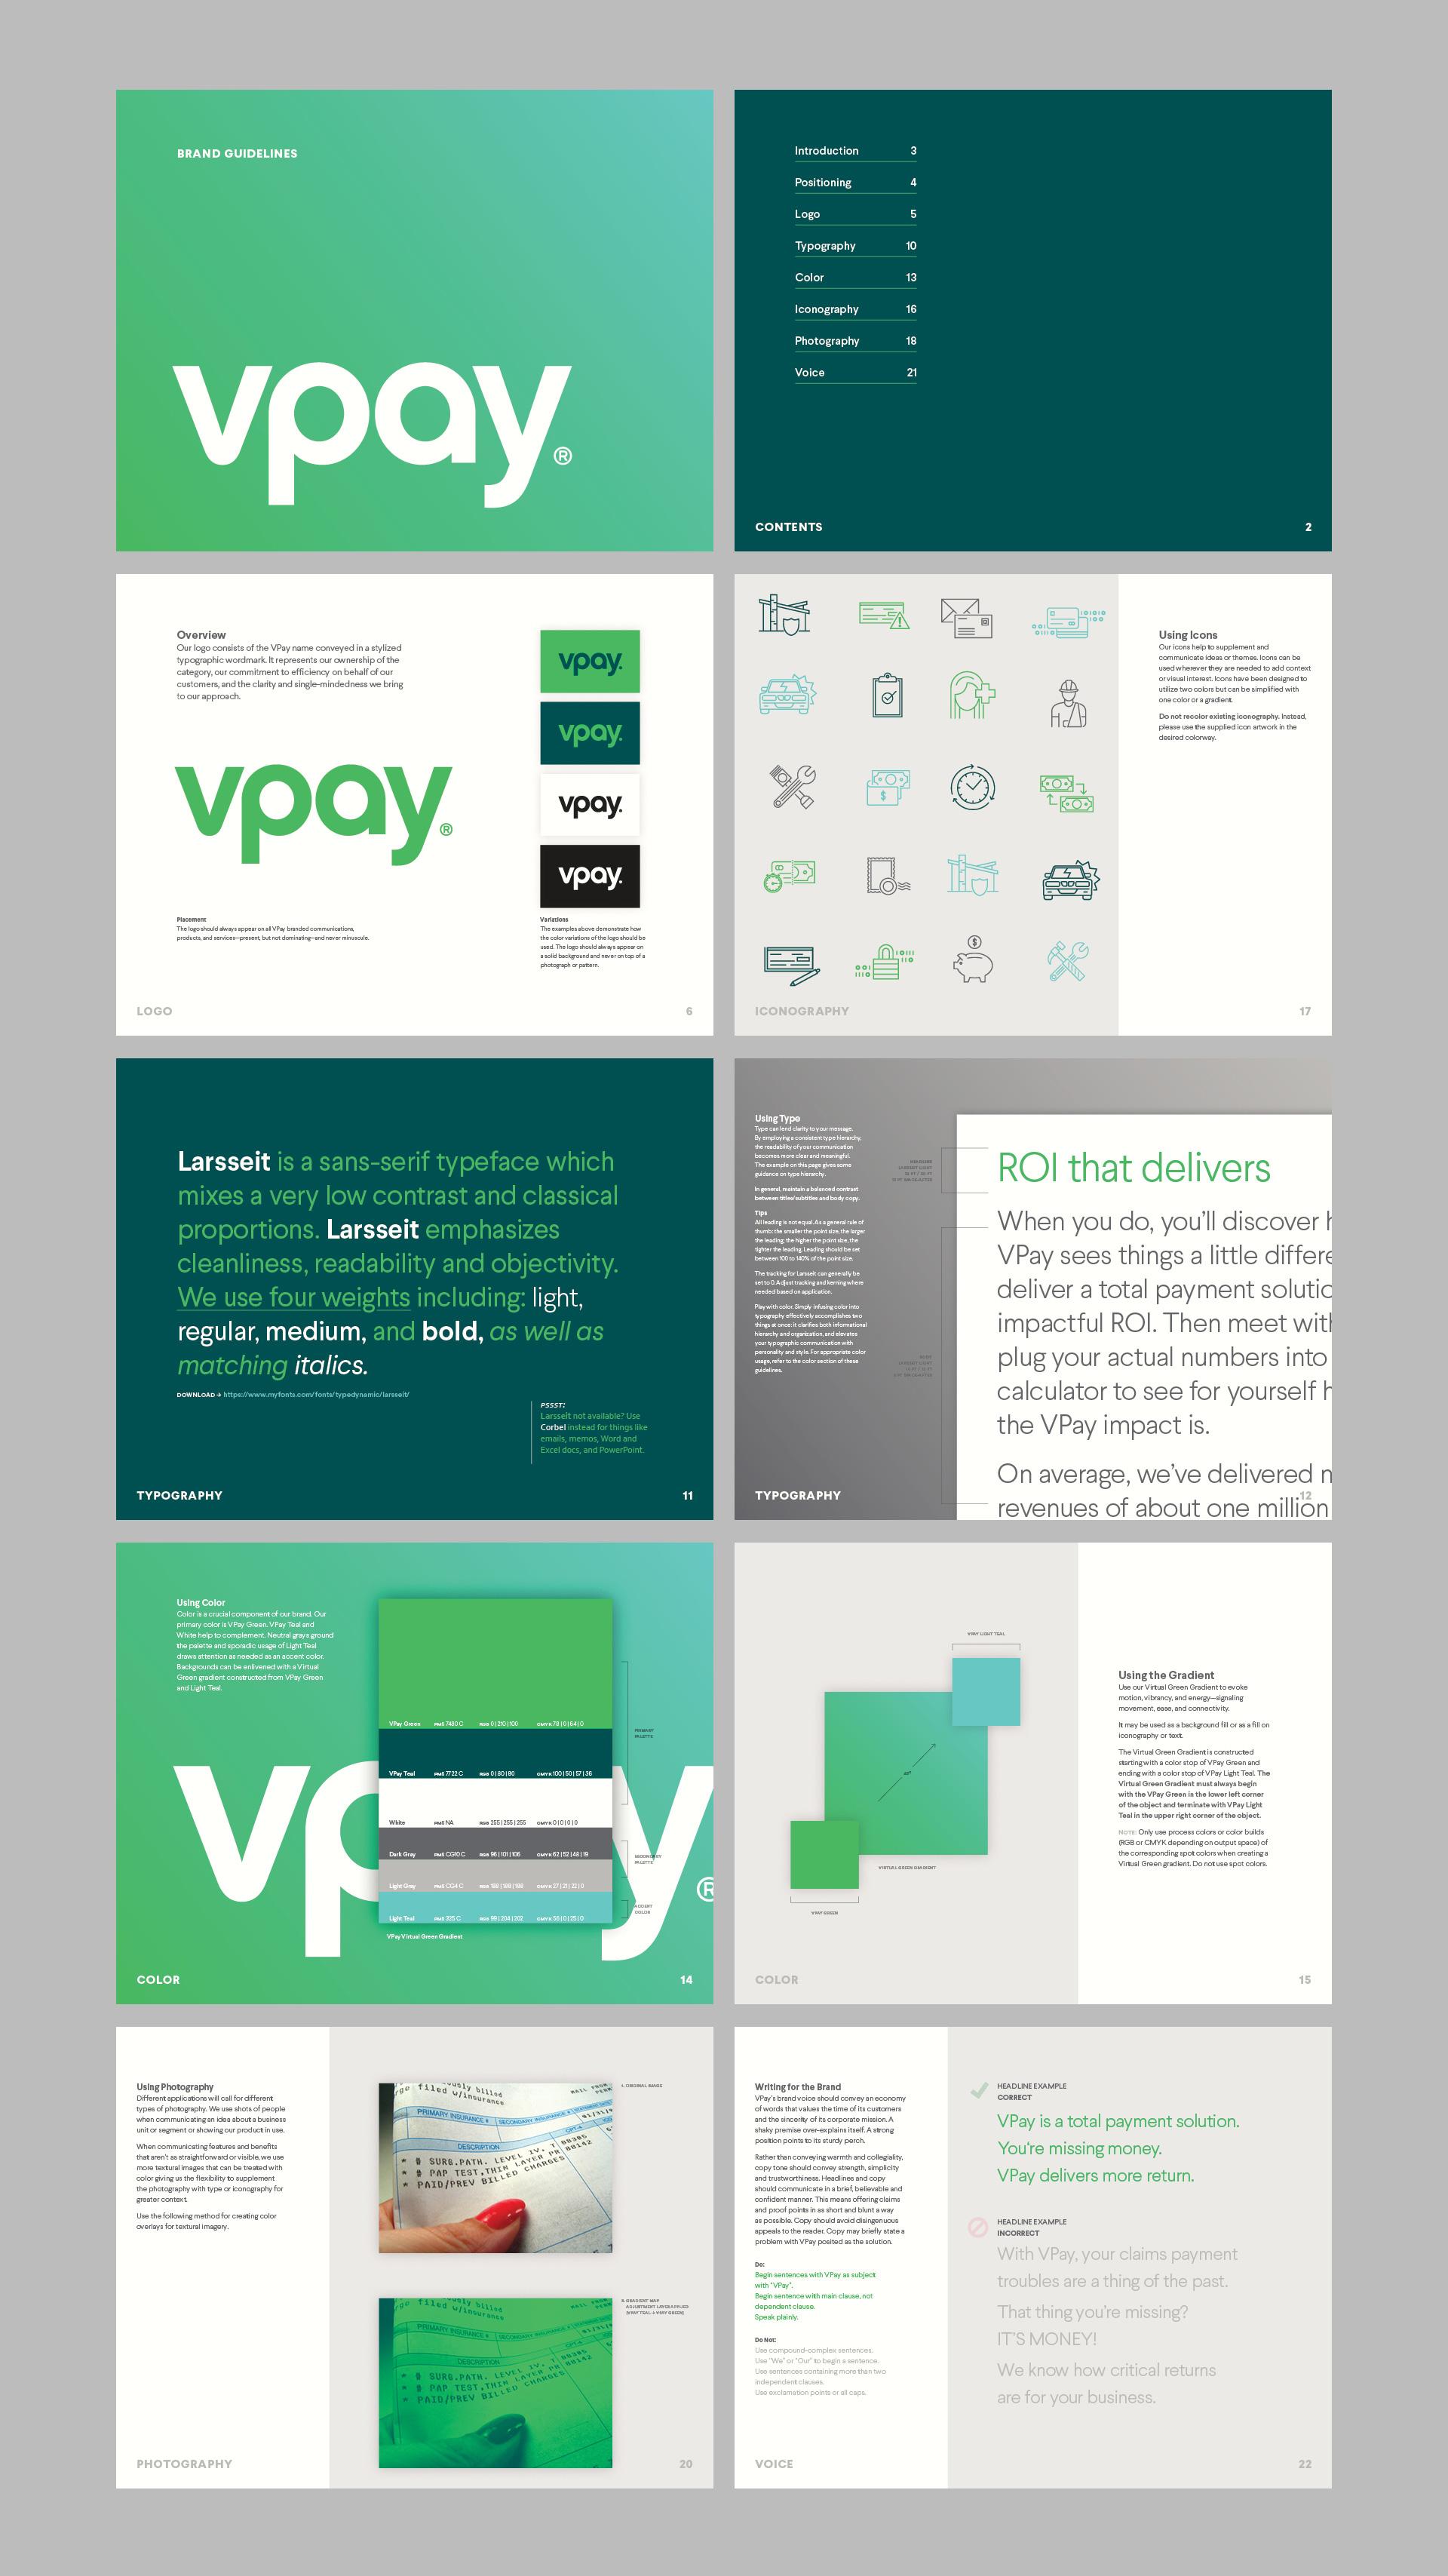 VPay_Case_Study_Guidelines_1920.jpg